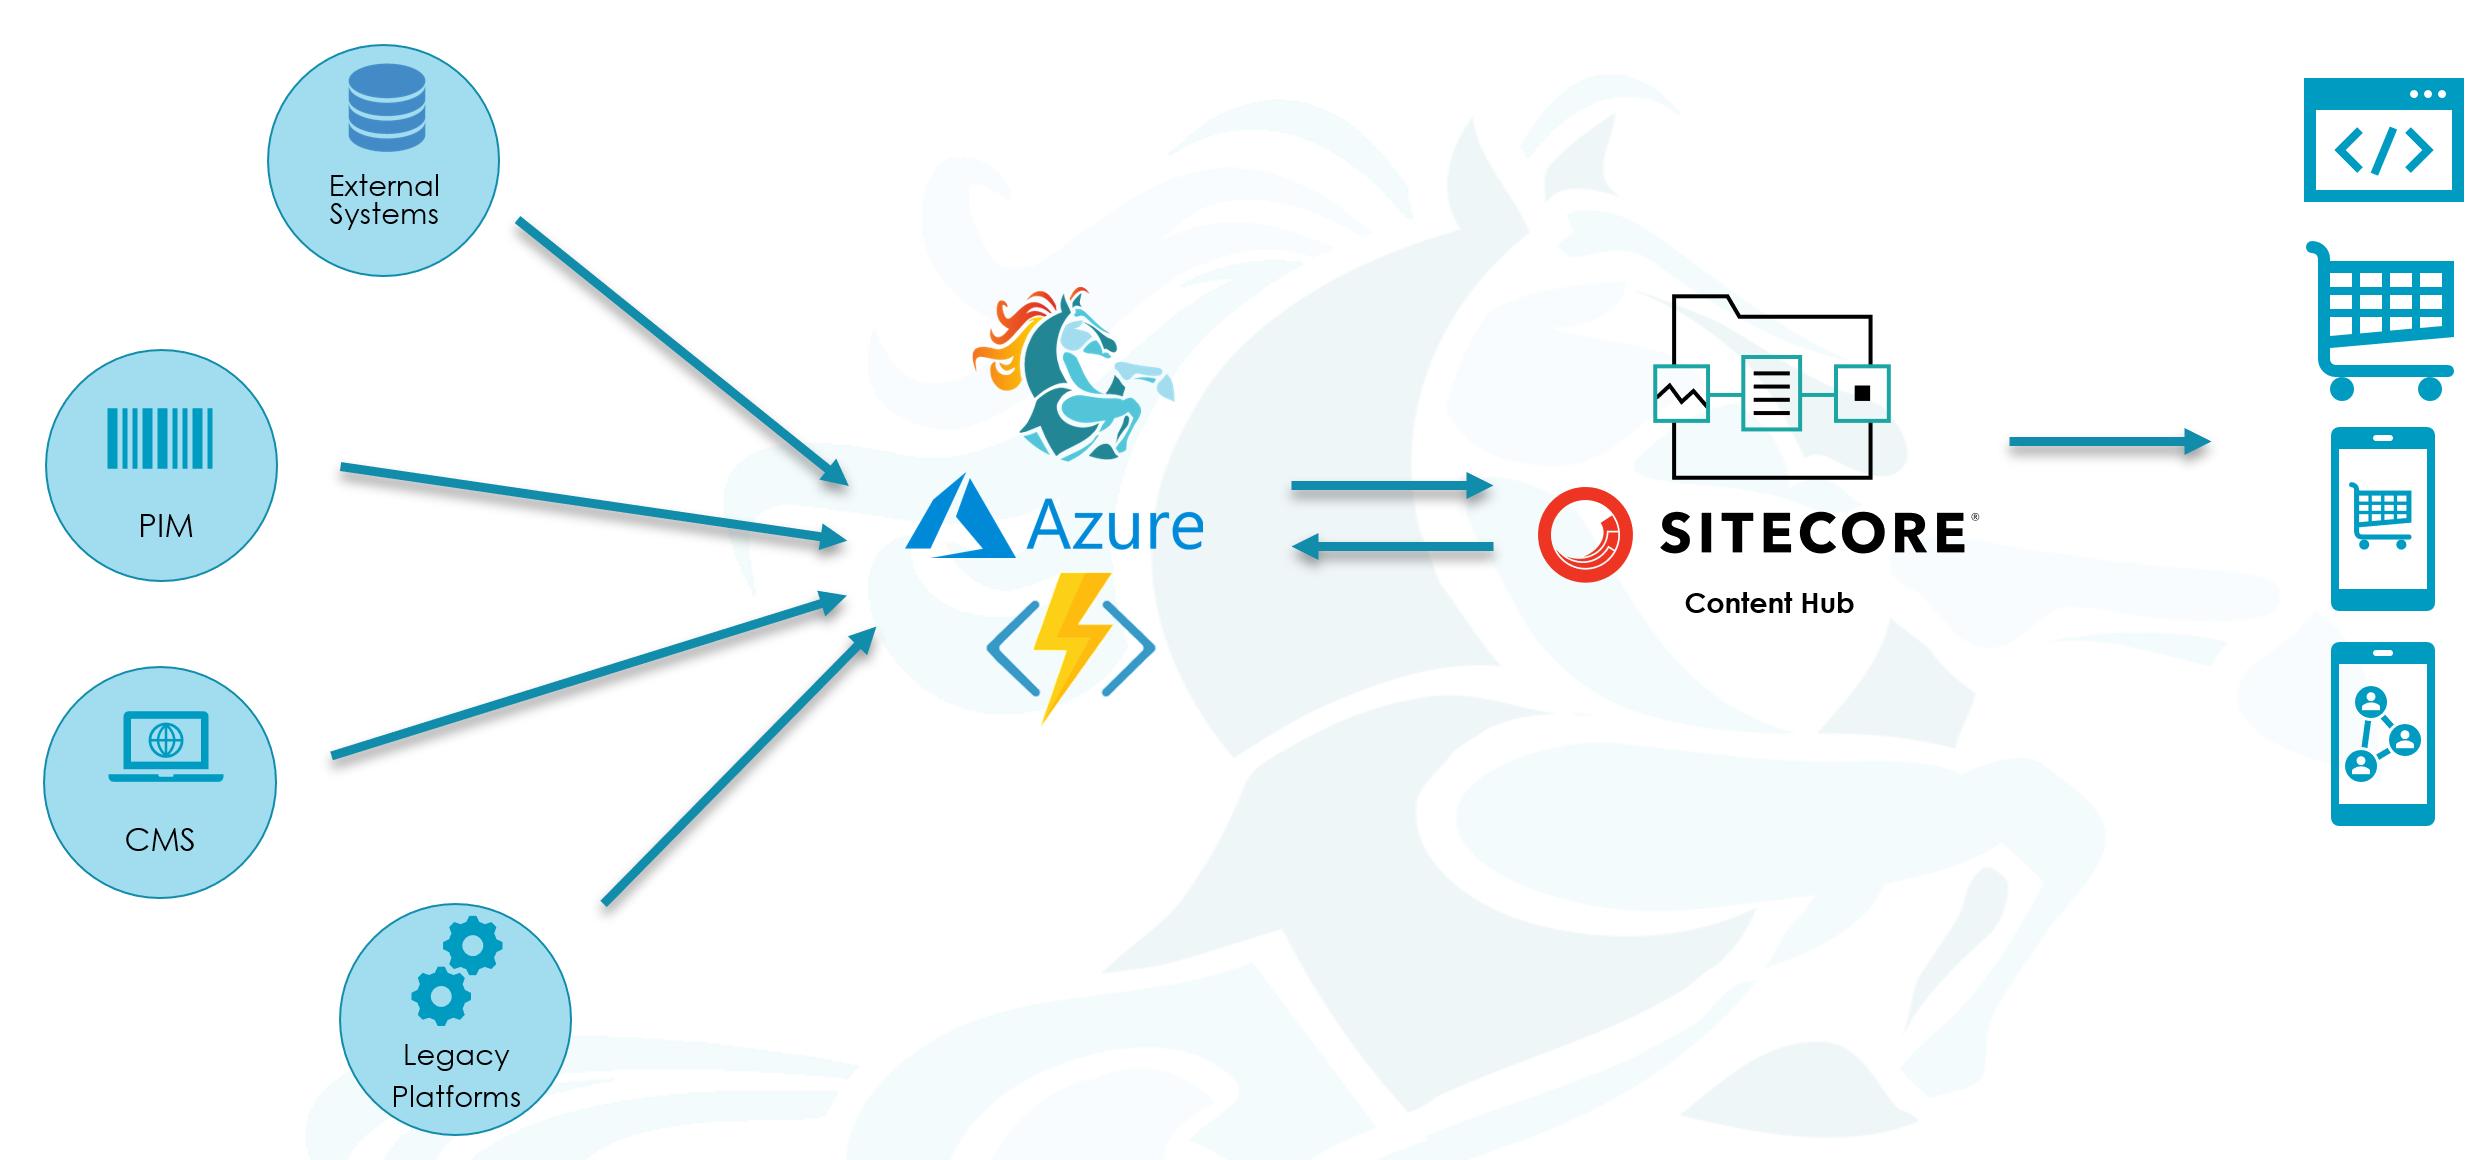 Sitecore Content Hub Data Migration